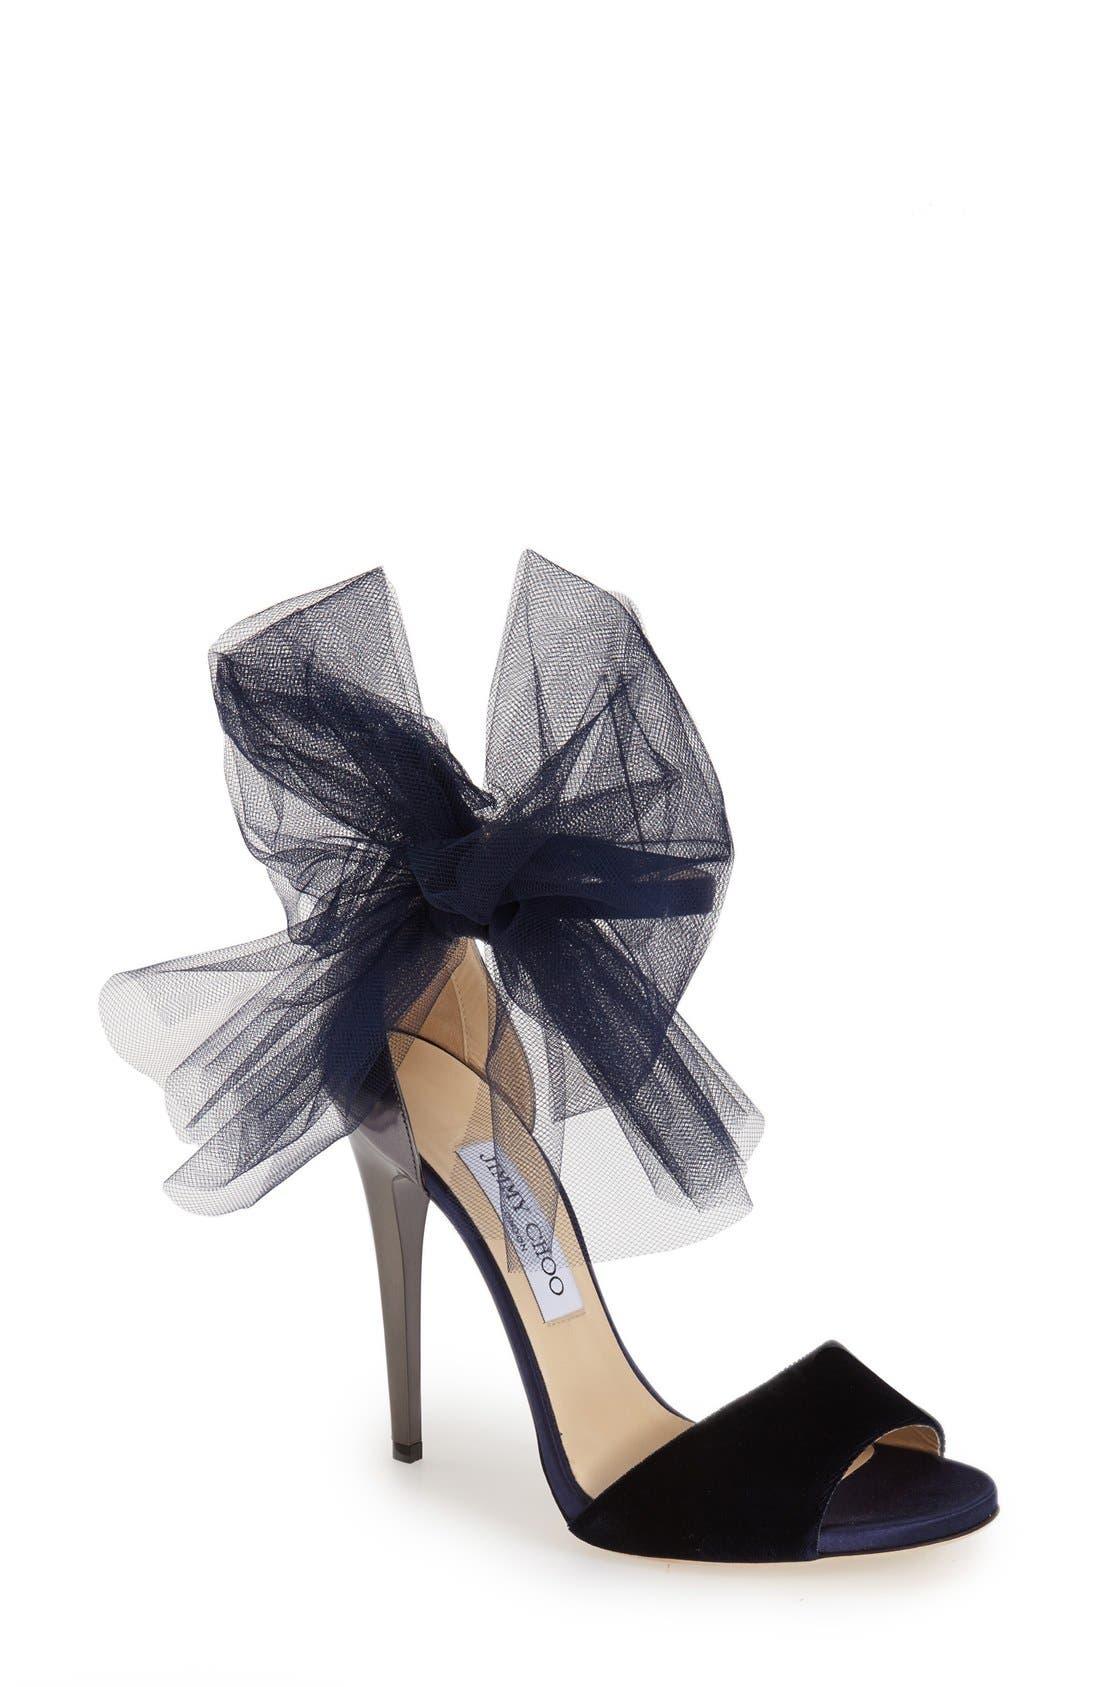 Alternate Image 1 Selected - Jimmy Choo 'Lilyth' Sandal (Women)